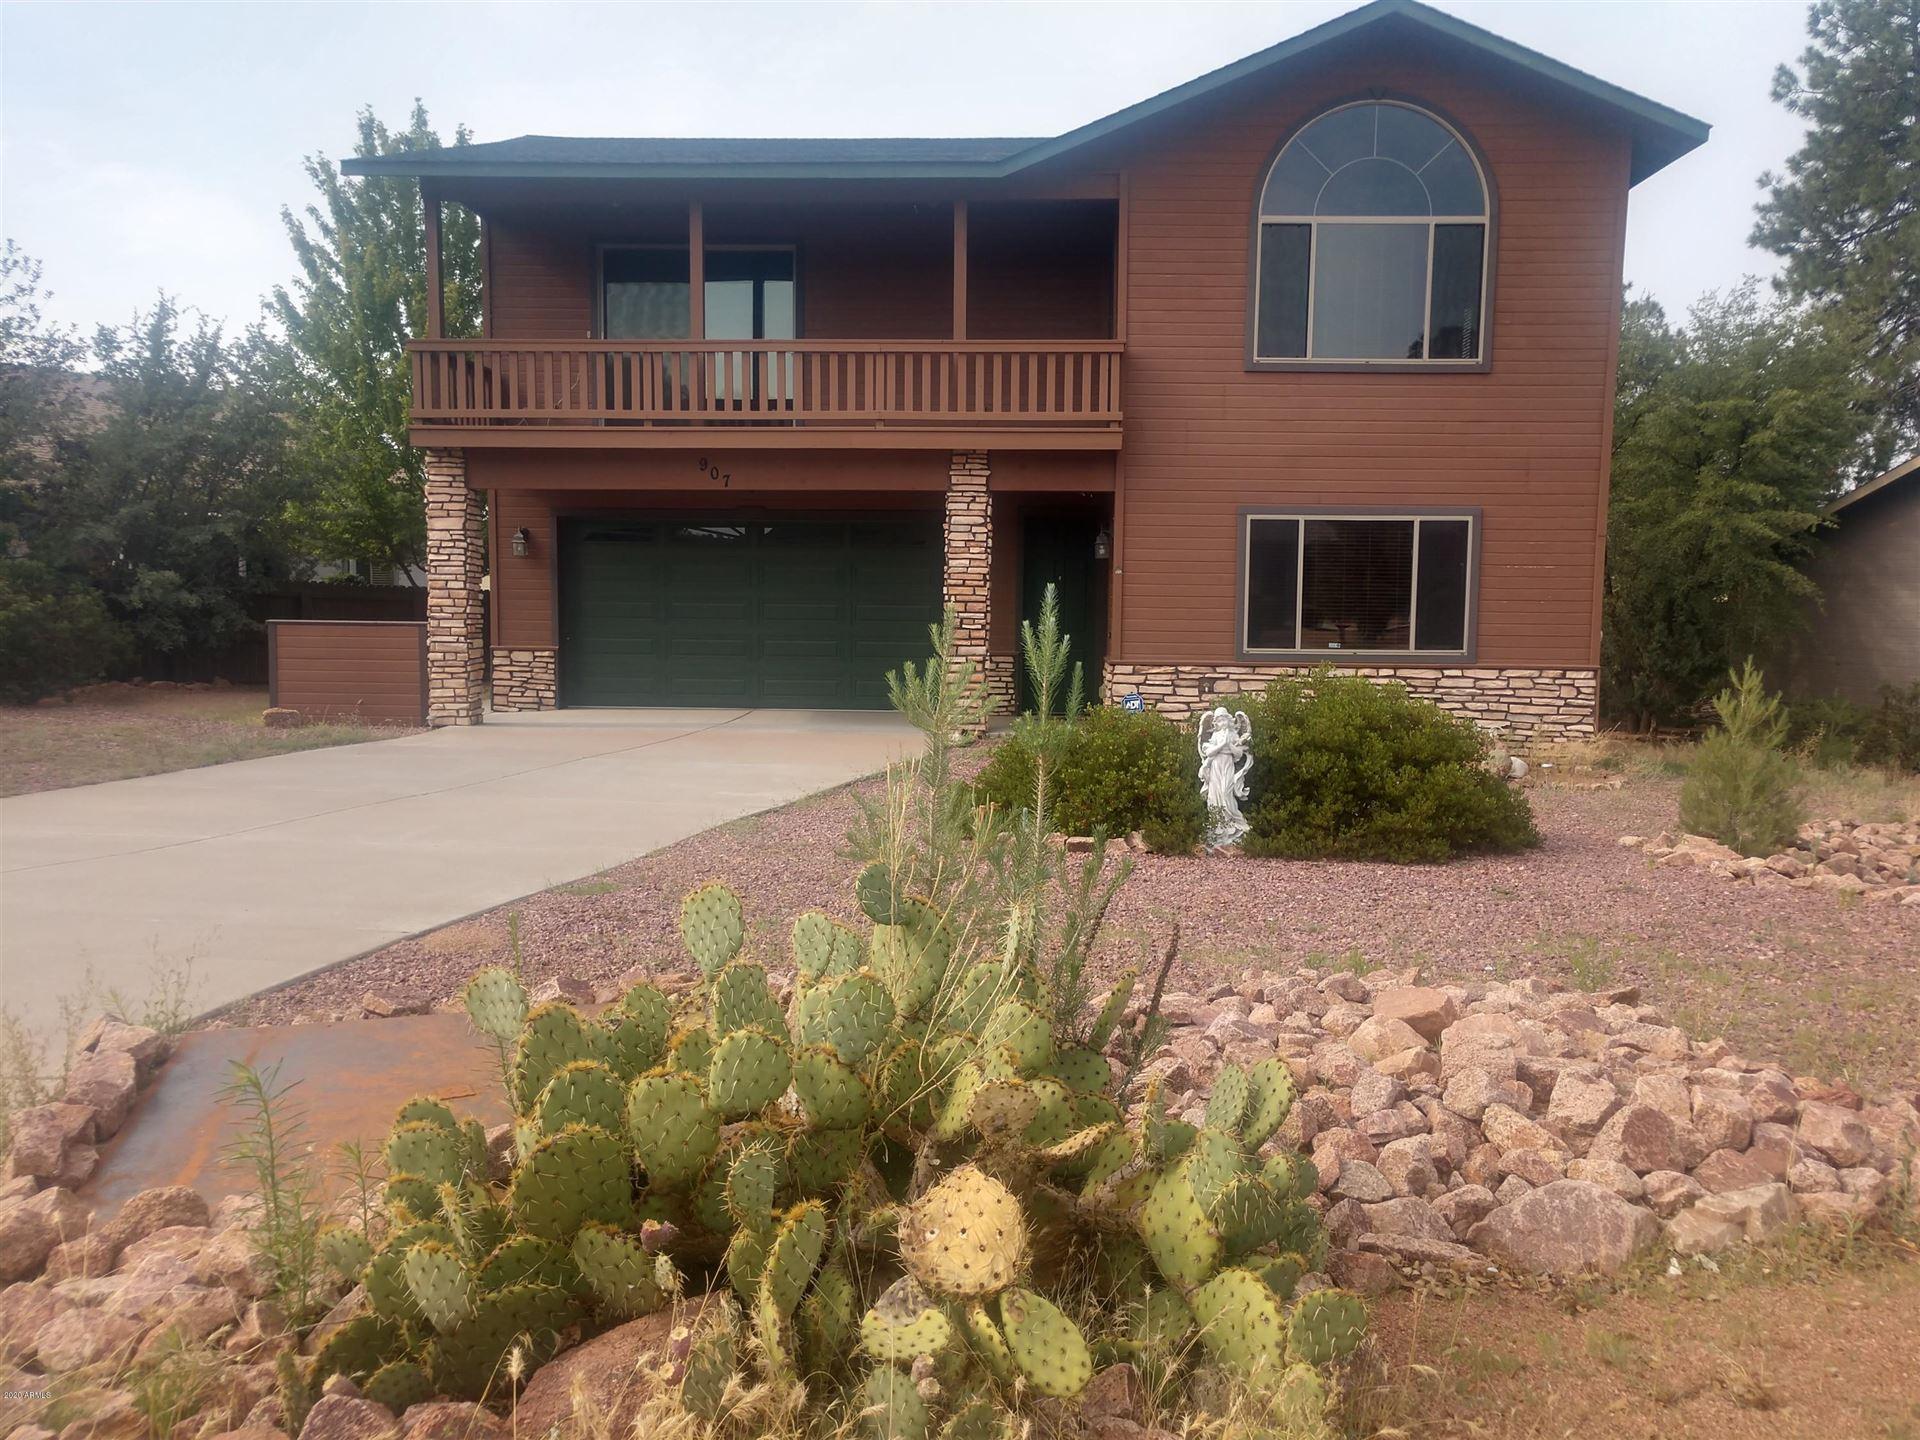 907 W Landmark Trail, Payson, AZ 85541 - MLS#: 6122930